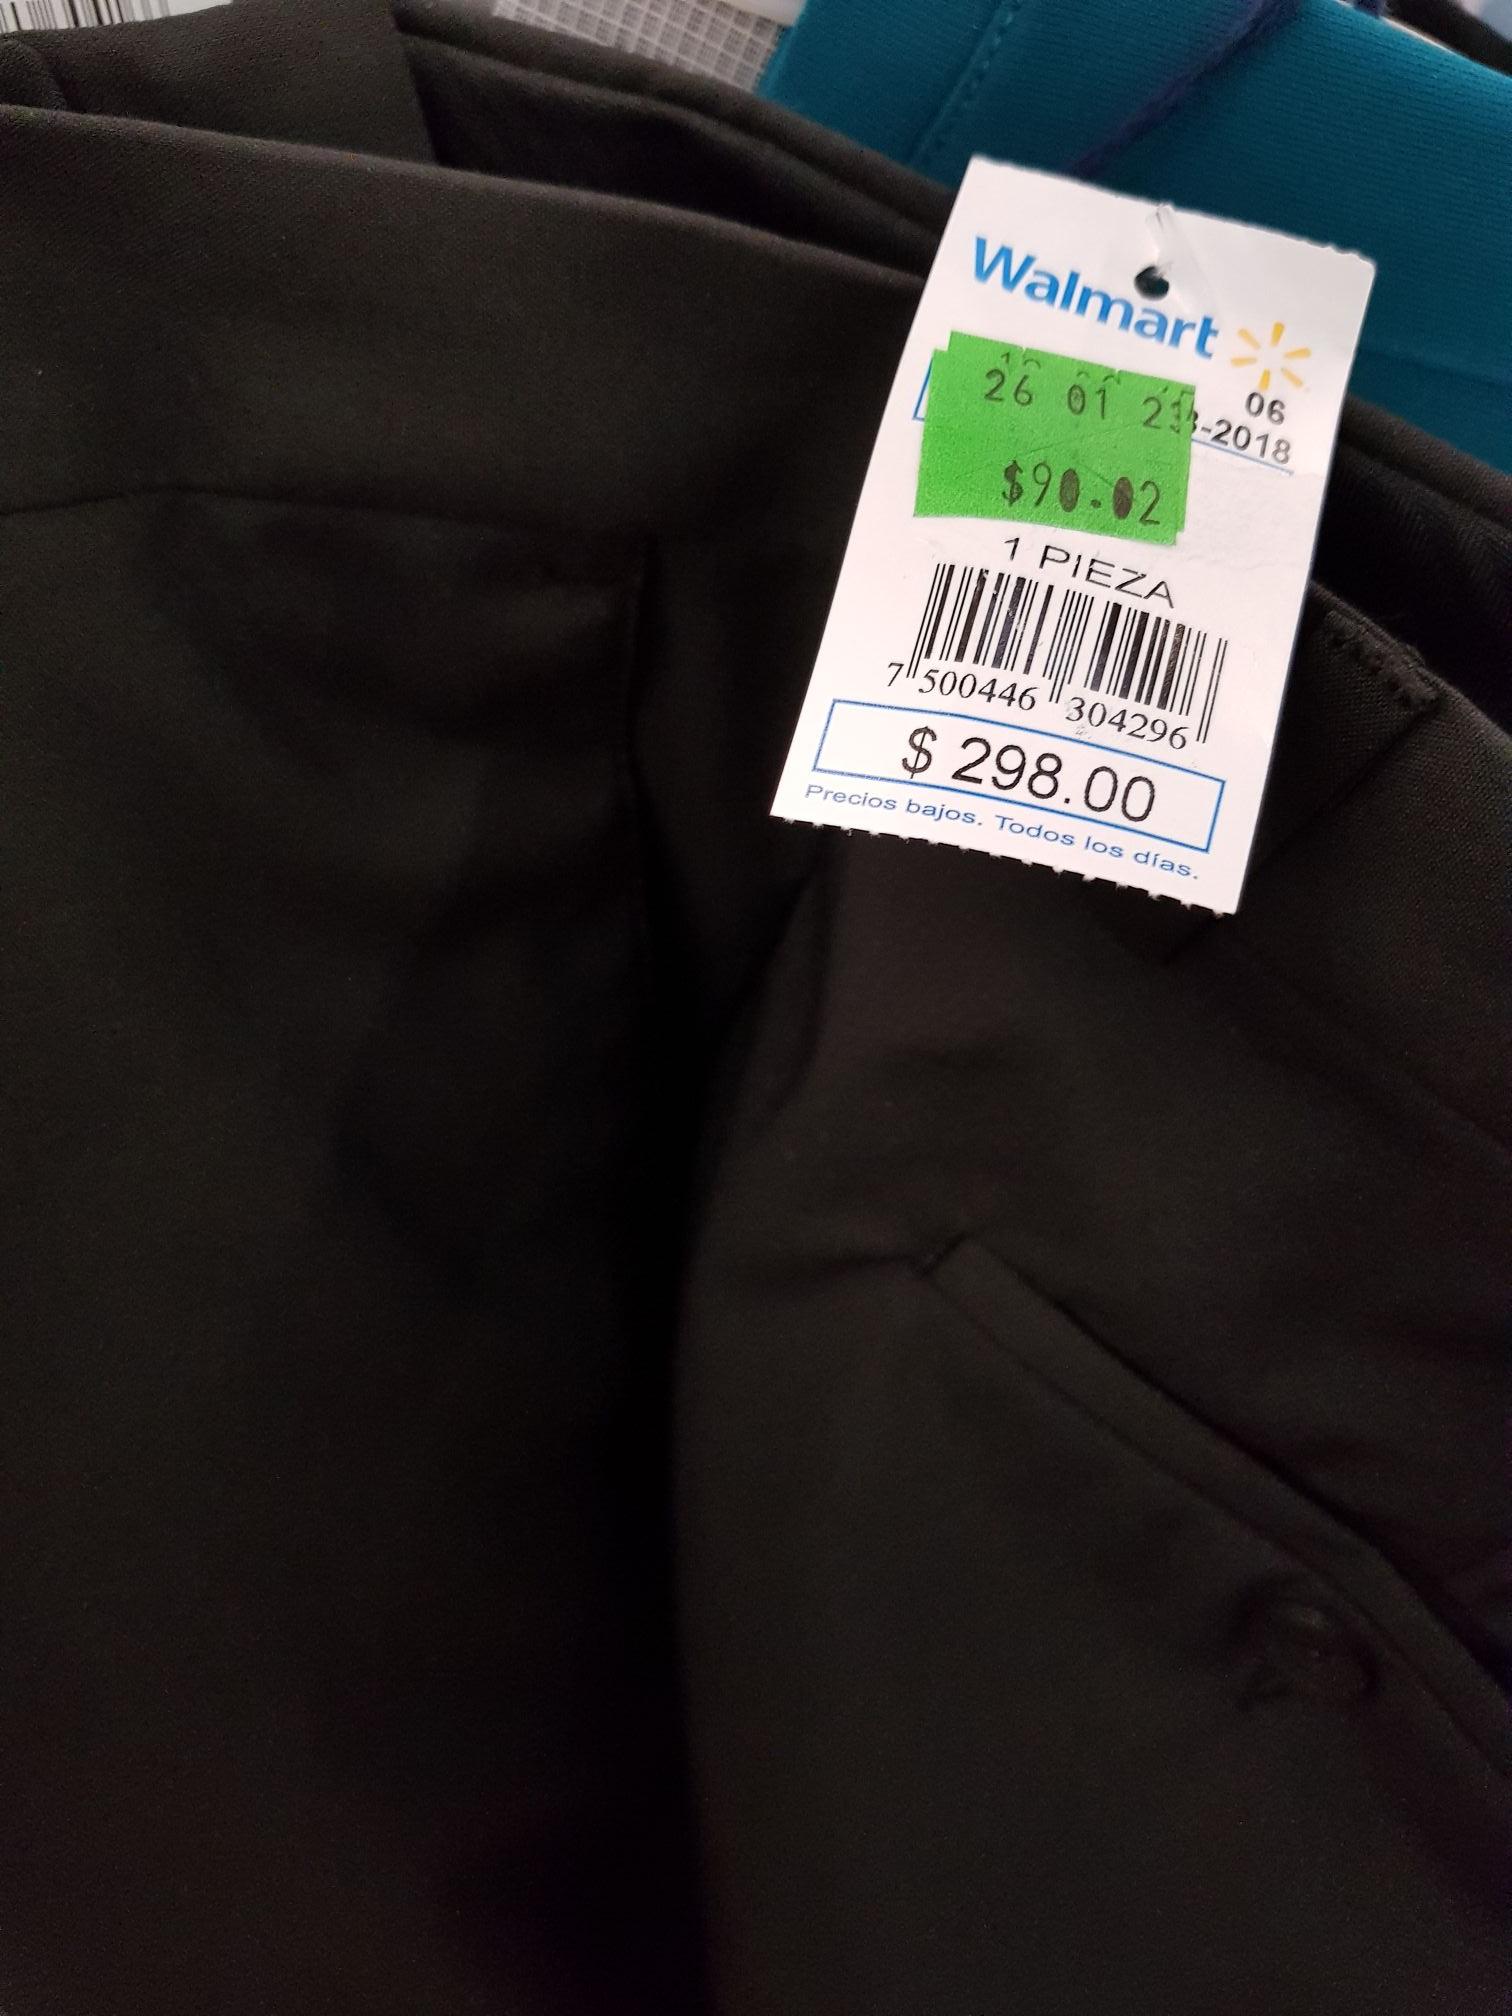 Walmart: Pantalón para. Hombre marca Yale